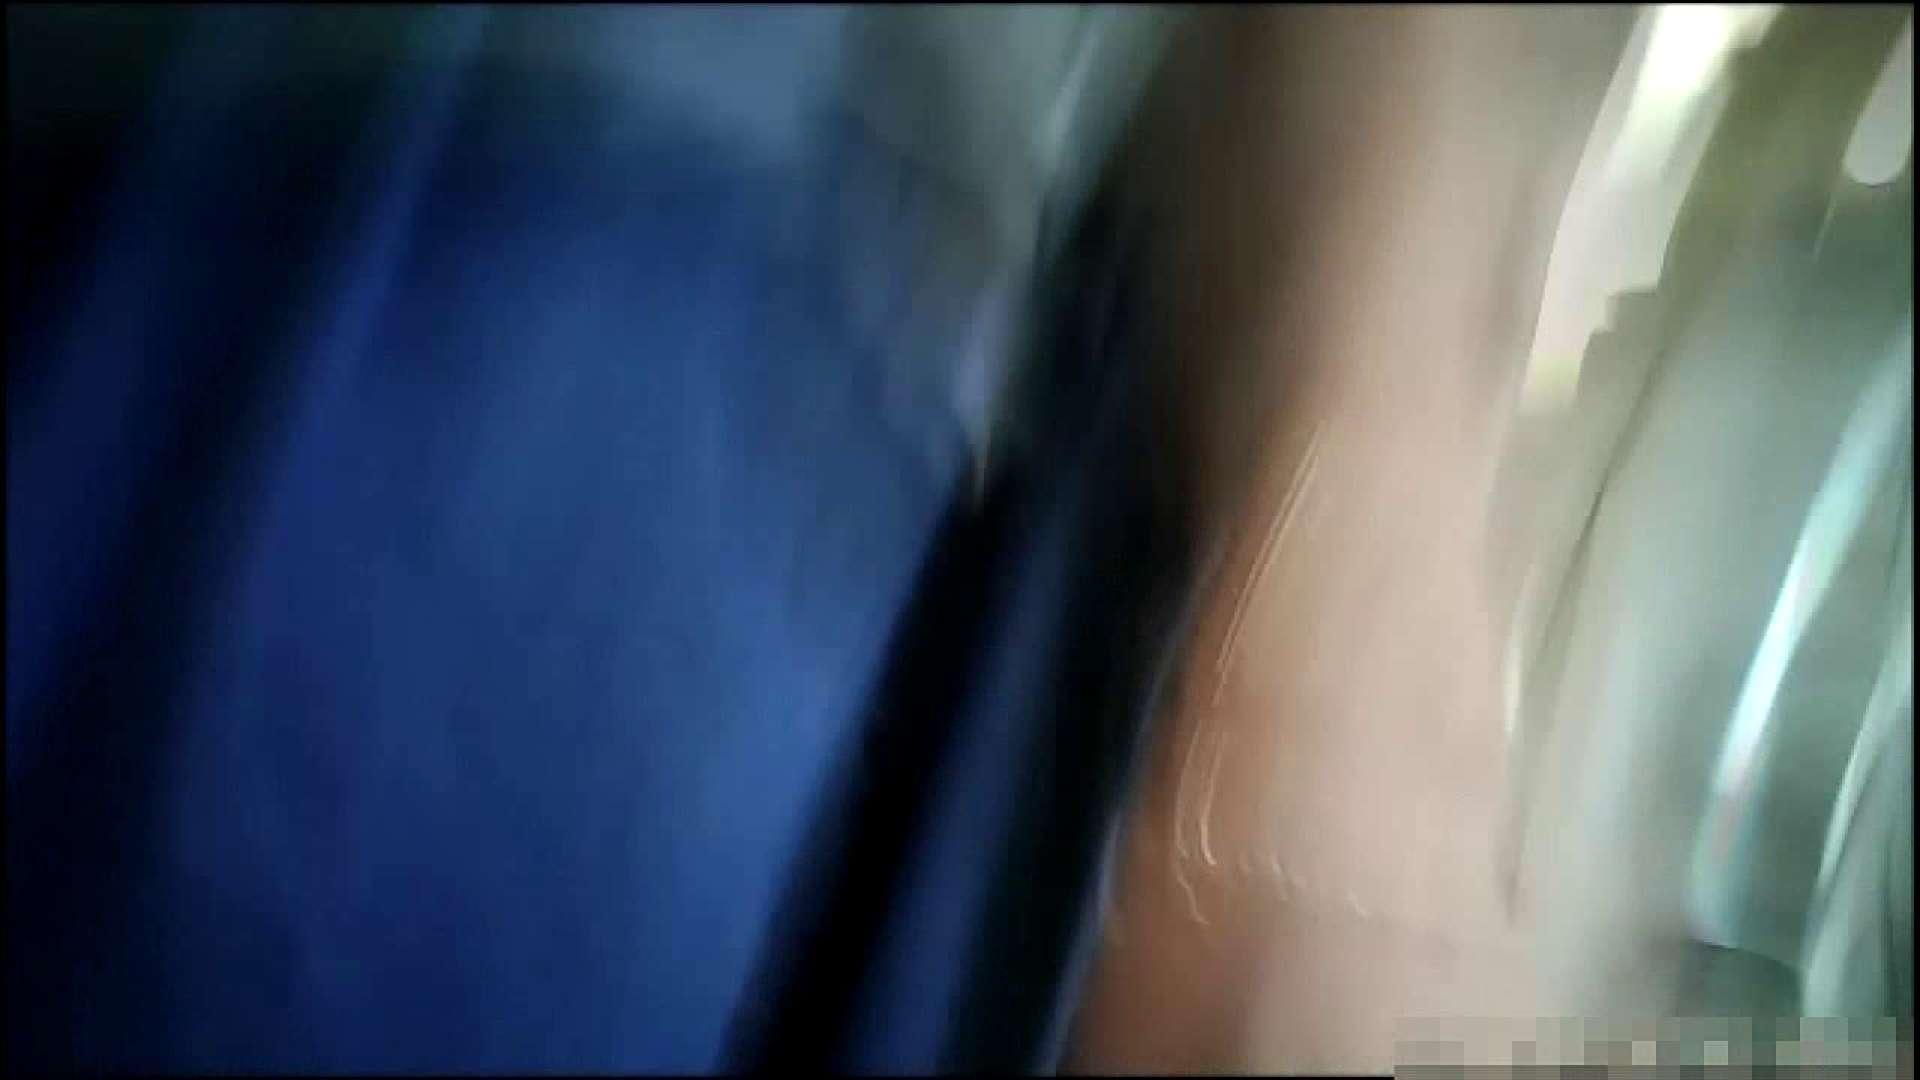 NO.3 友人間の情報で「処女」が確定している友達【某有名雑貨店】 チラ  69pic 1